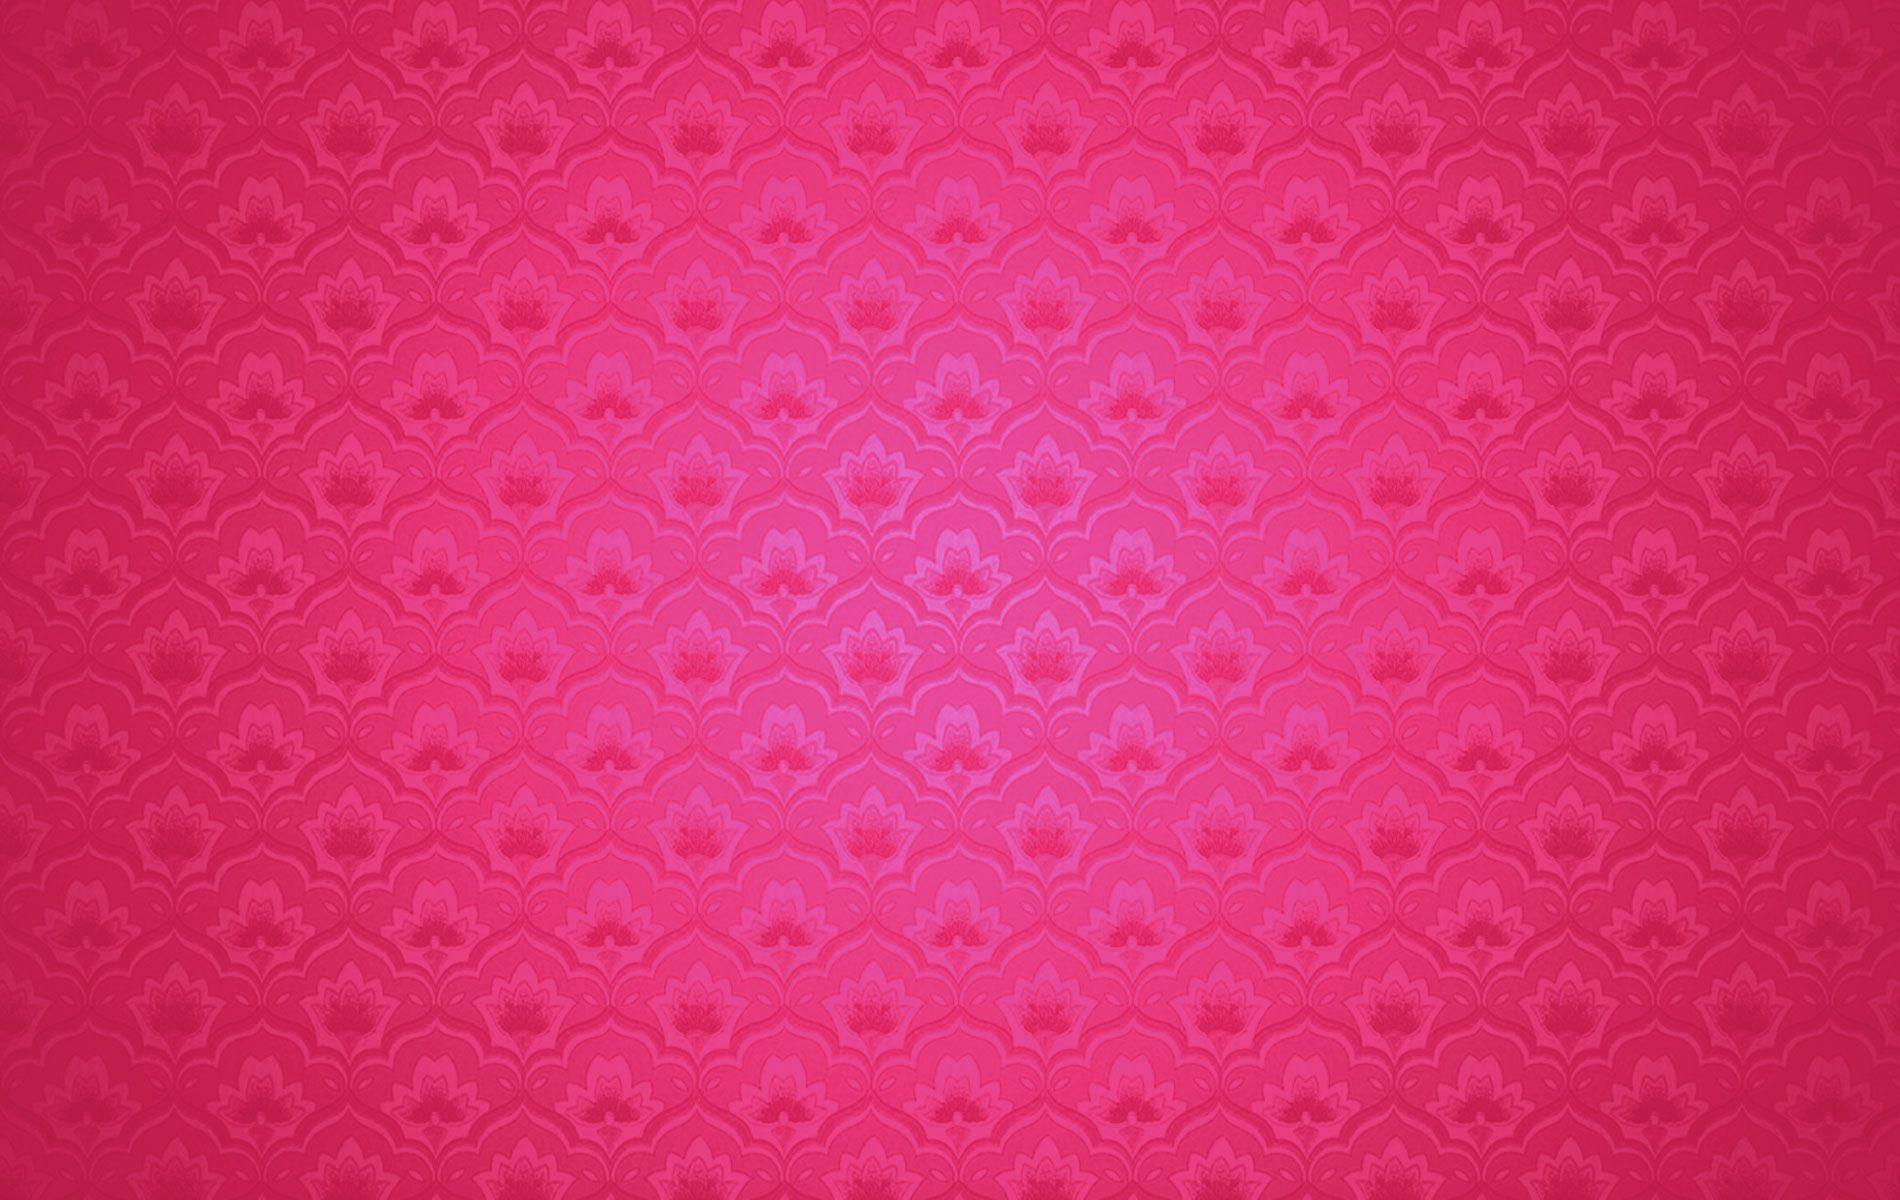 pink wallpaper city hd - photo #6